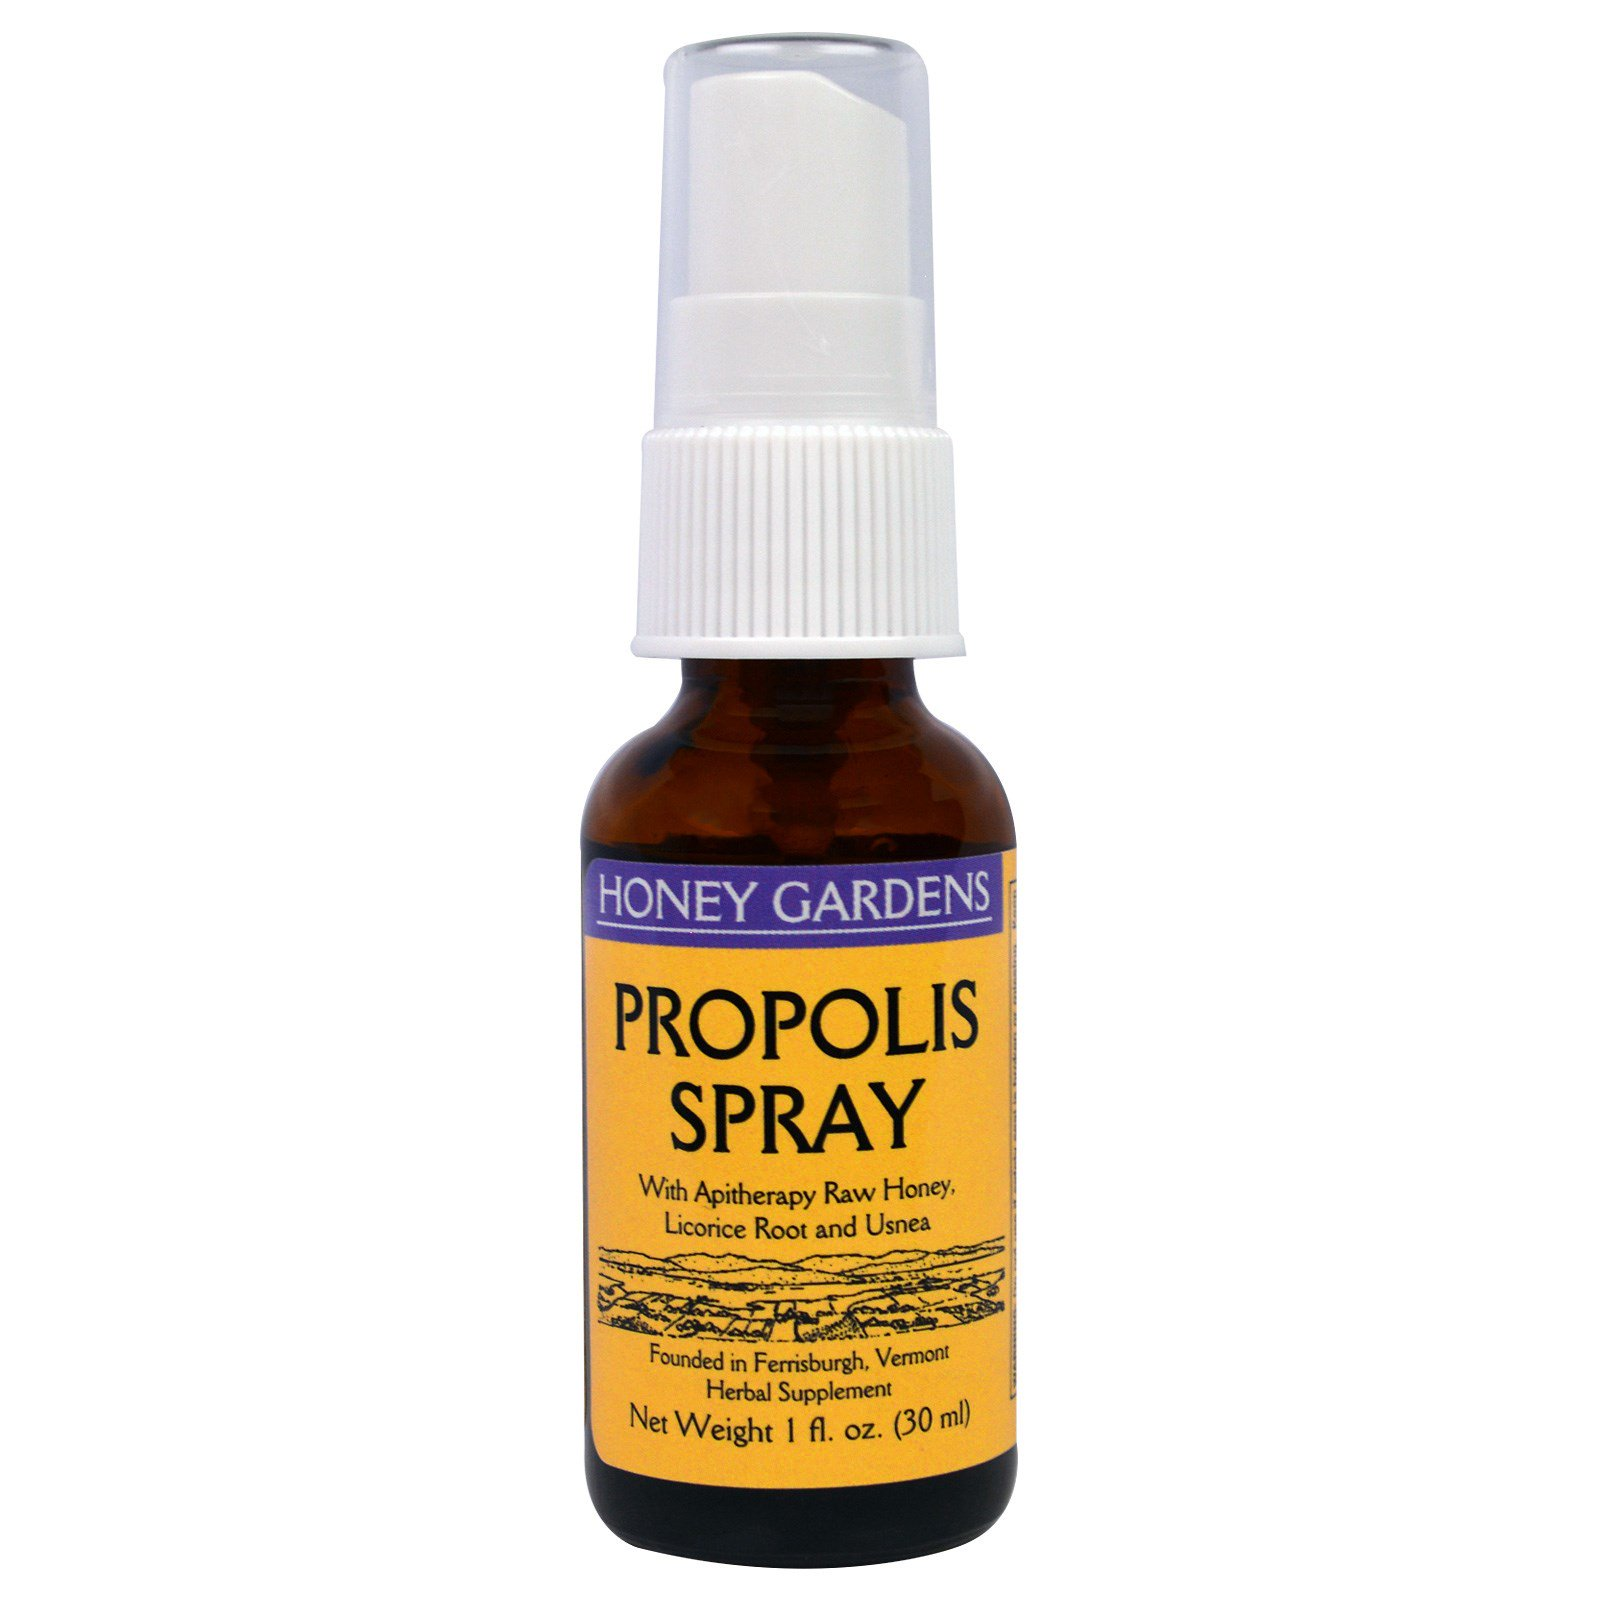 Propolis Moment Brazilian Nano Per Box5btl Honey Gardens Spray 1 Fl Oz 30 Ml